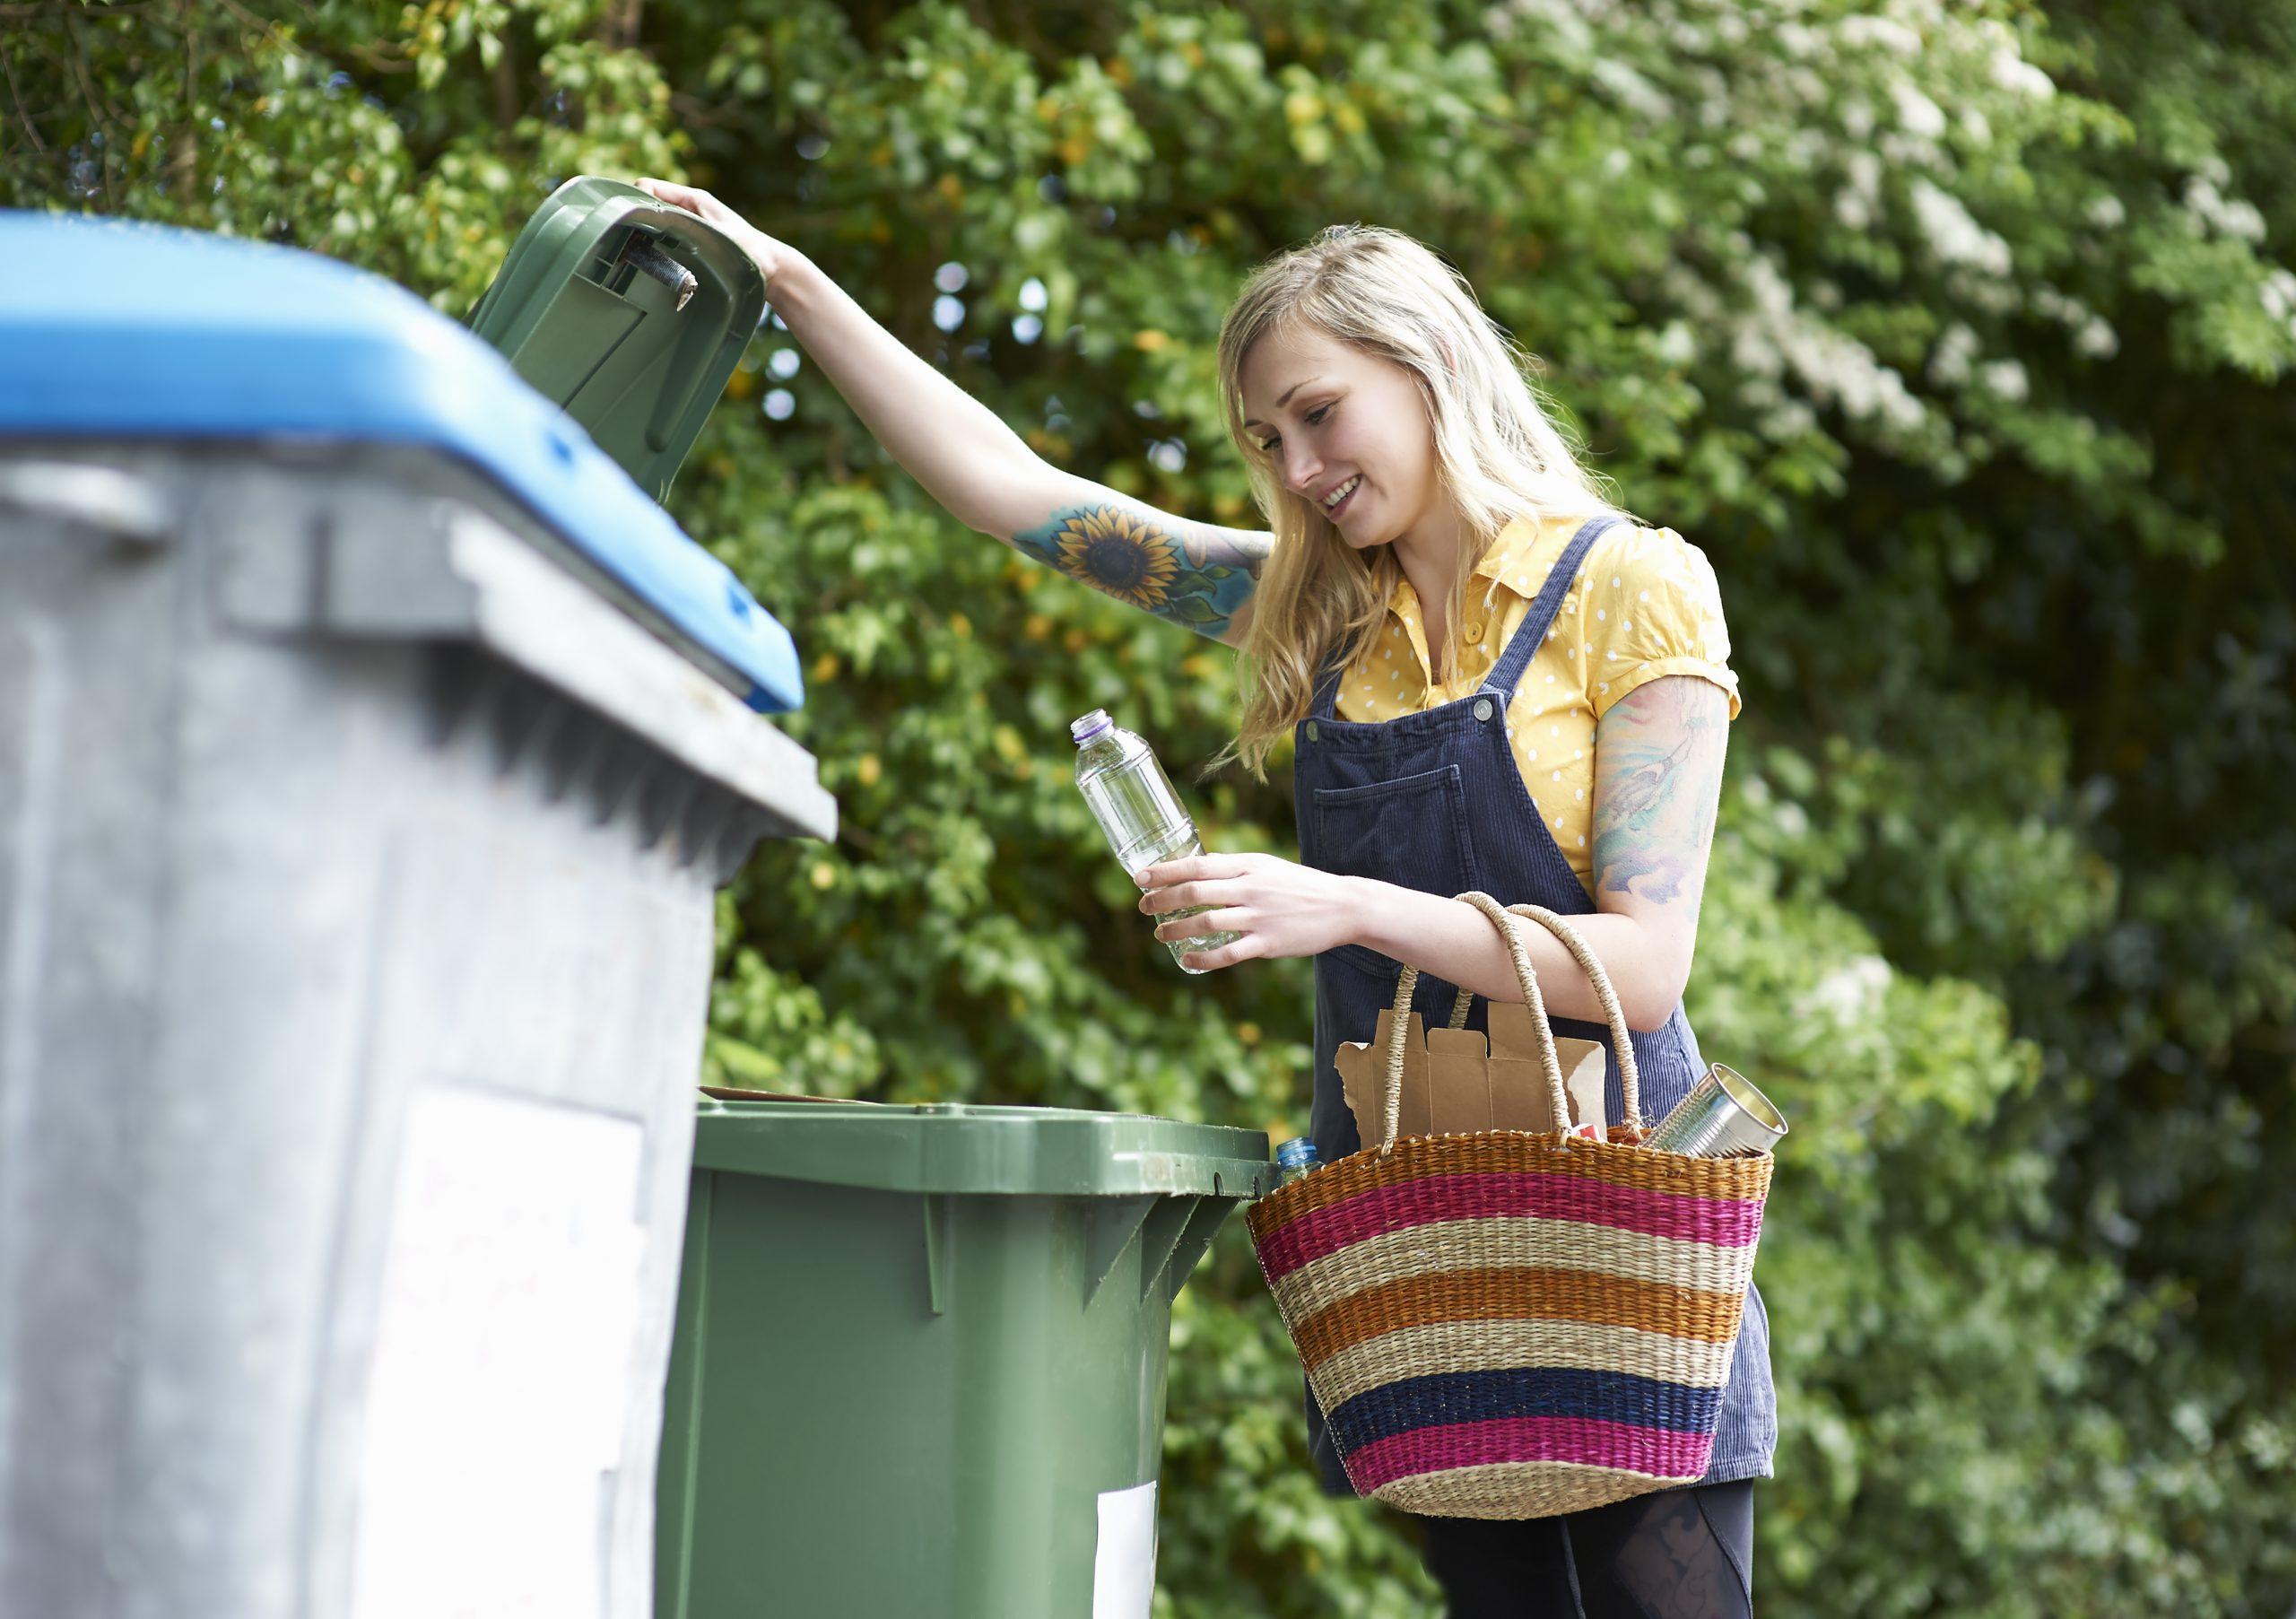 Eco-friendly declutter